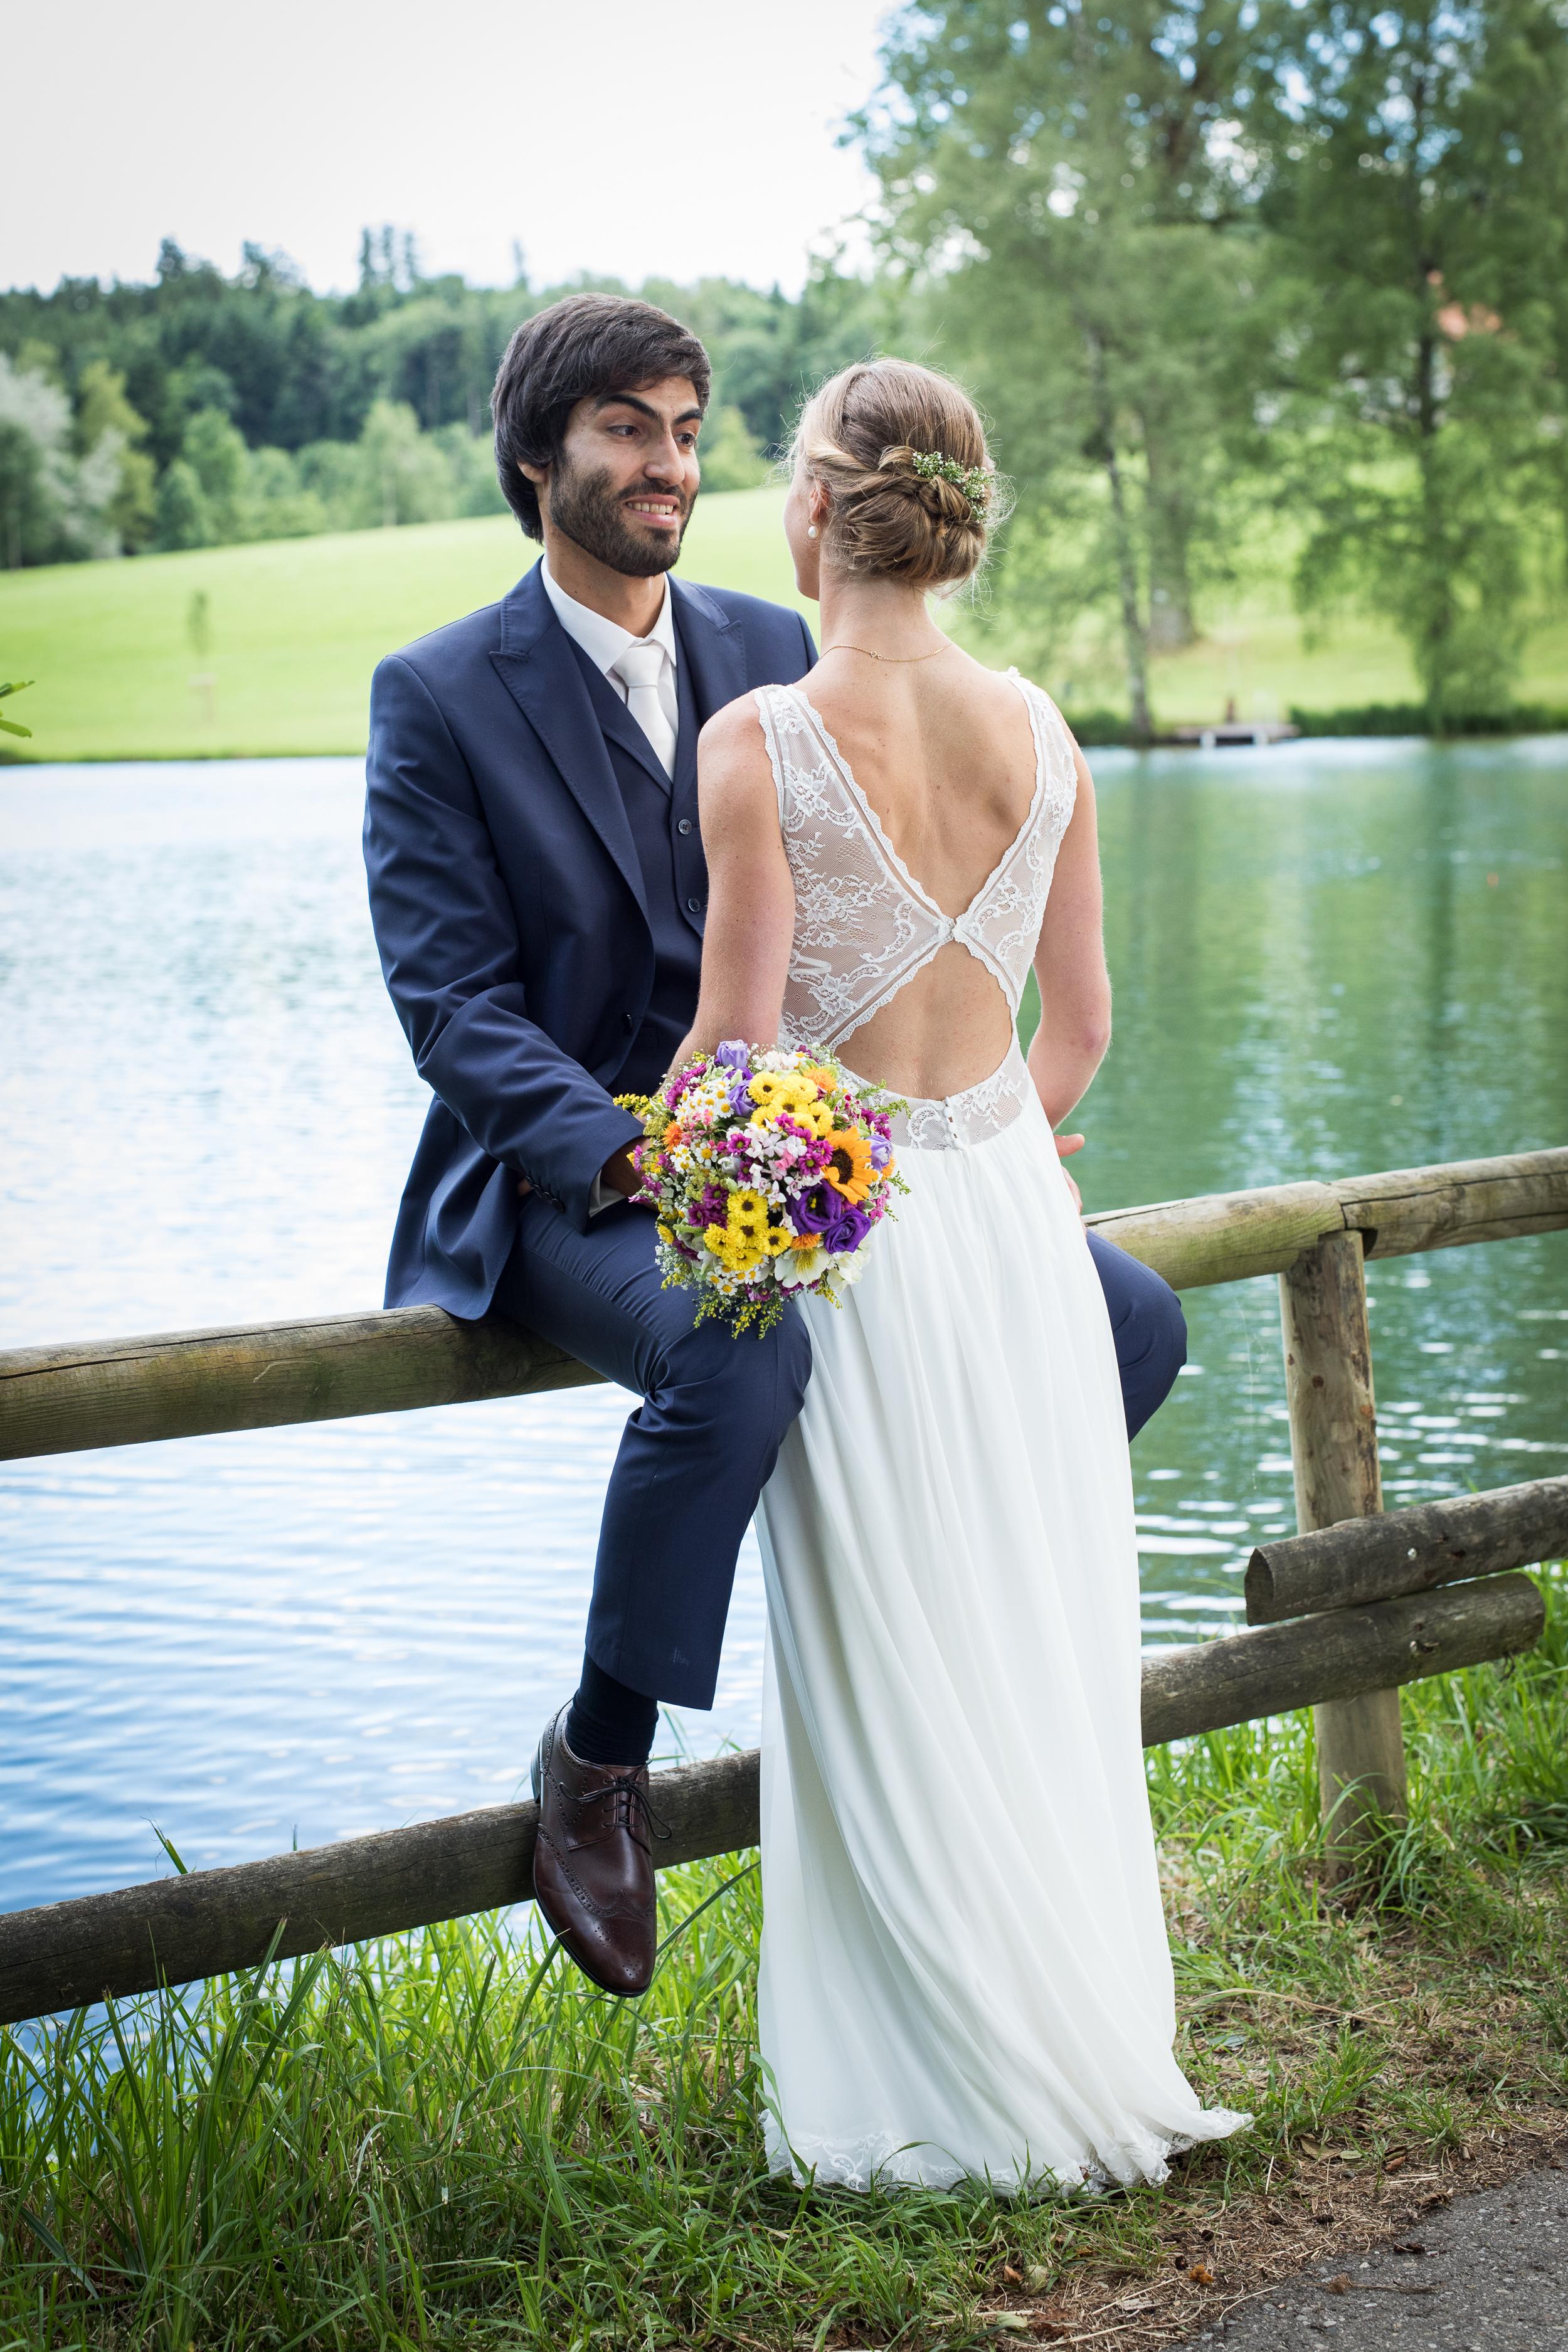 Gregg_Thorne_Wedding_Photographer_Munich_051.jpg